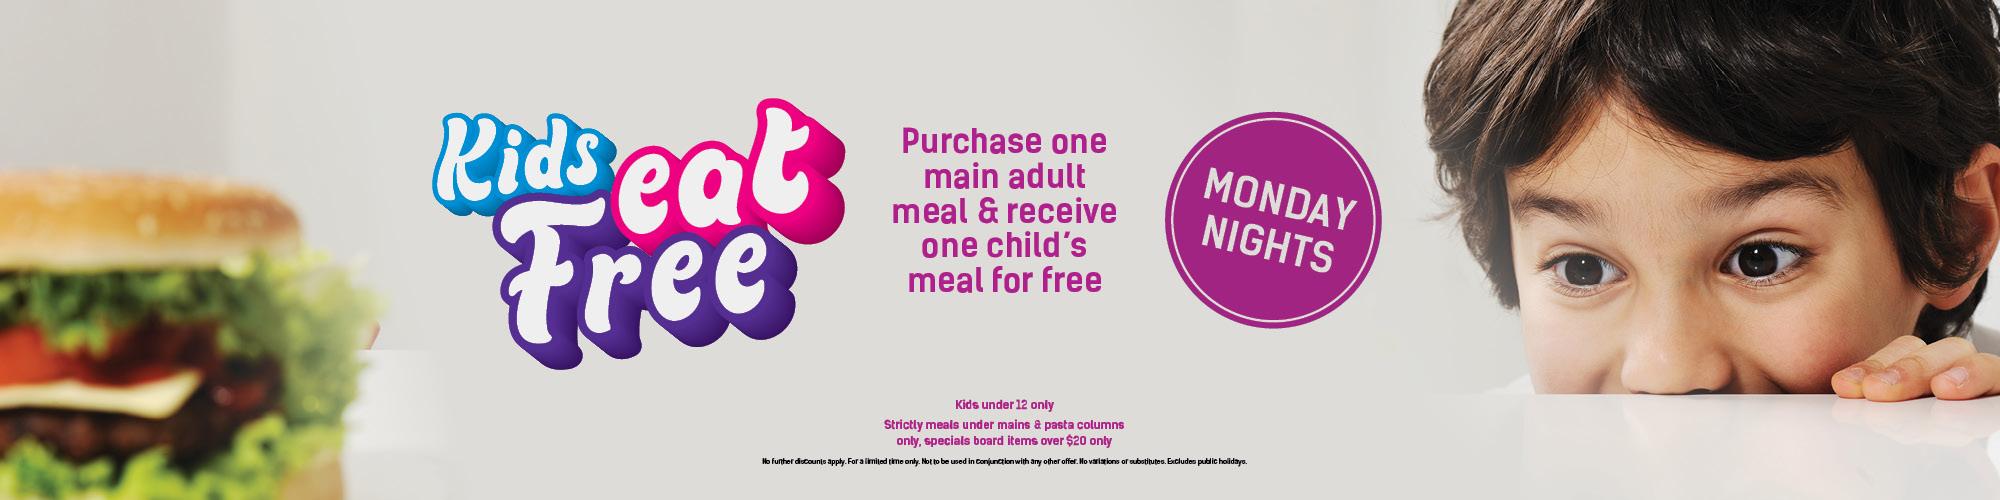 Maze-Kids-Eat-Free-2017-Web-Slider